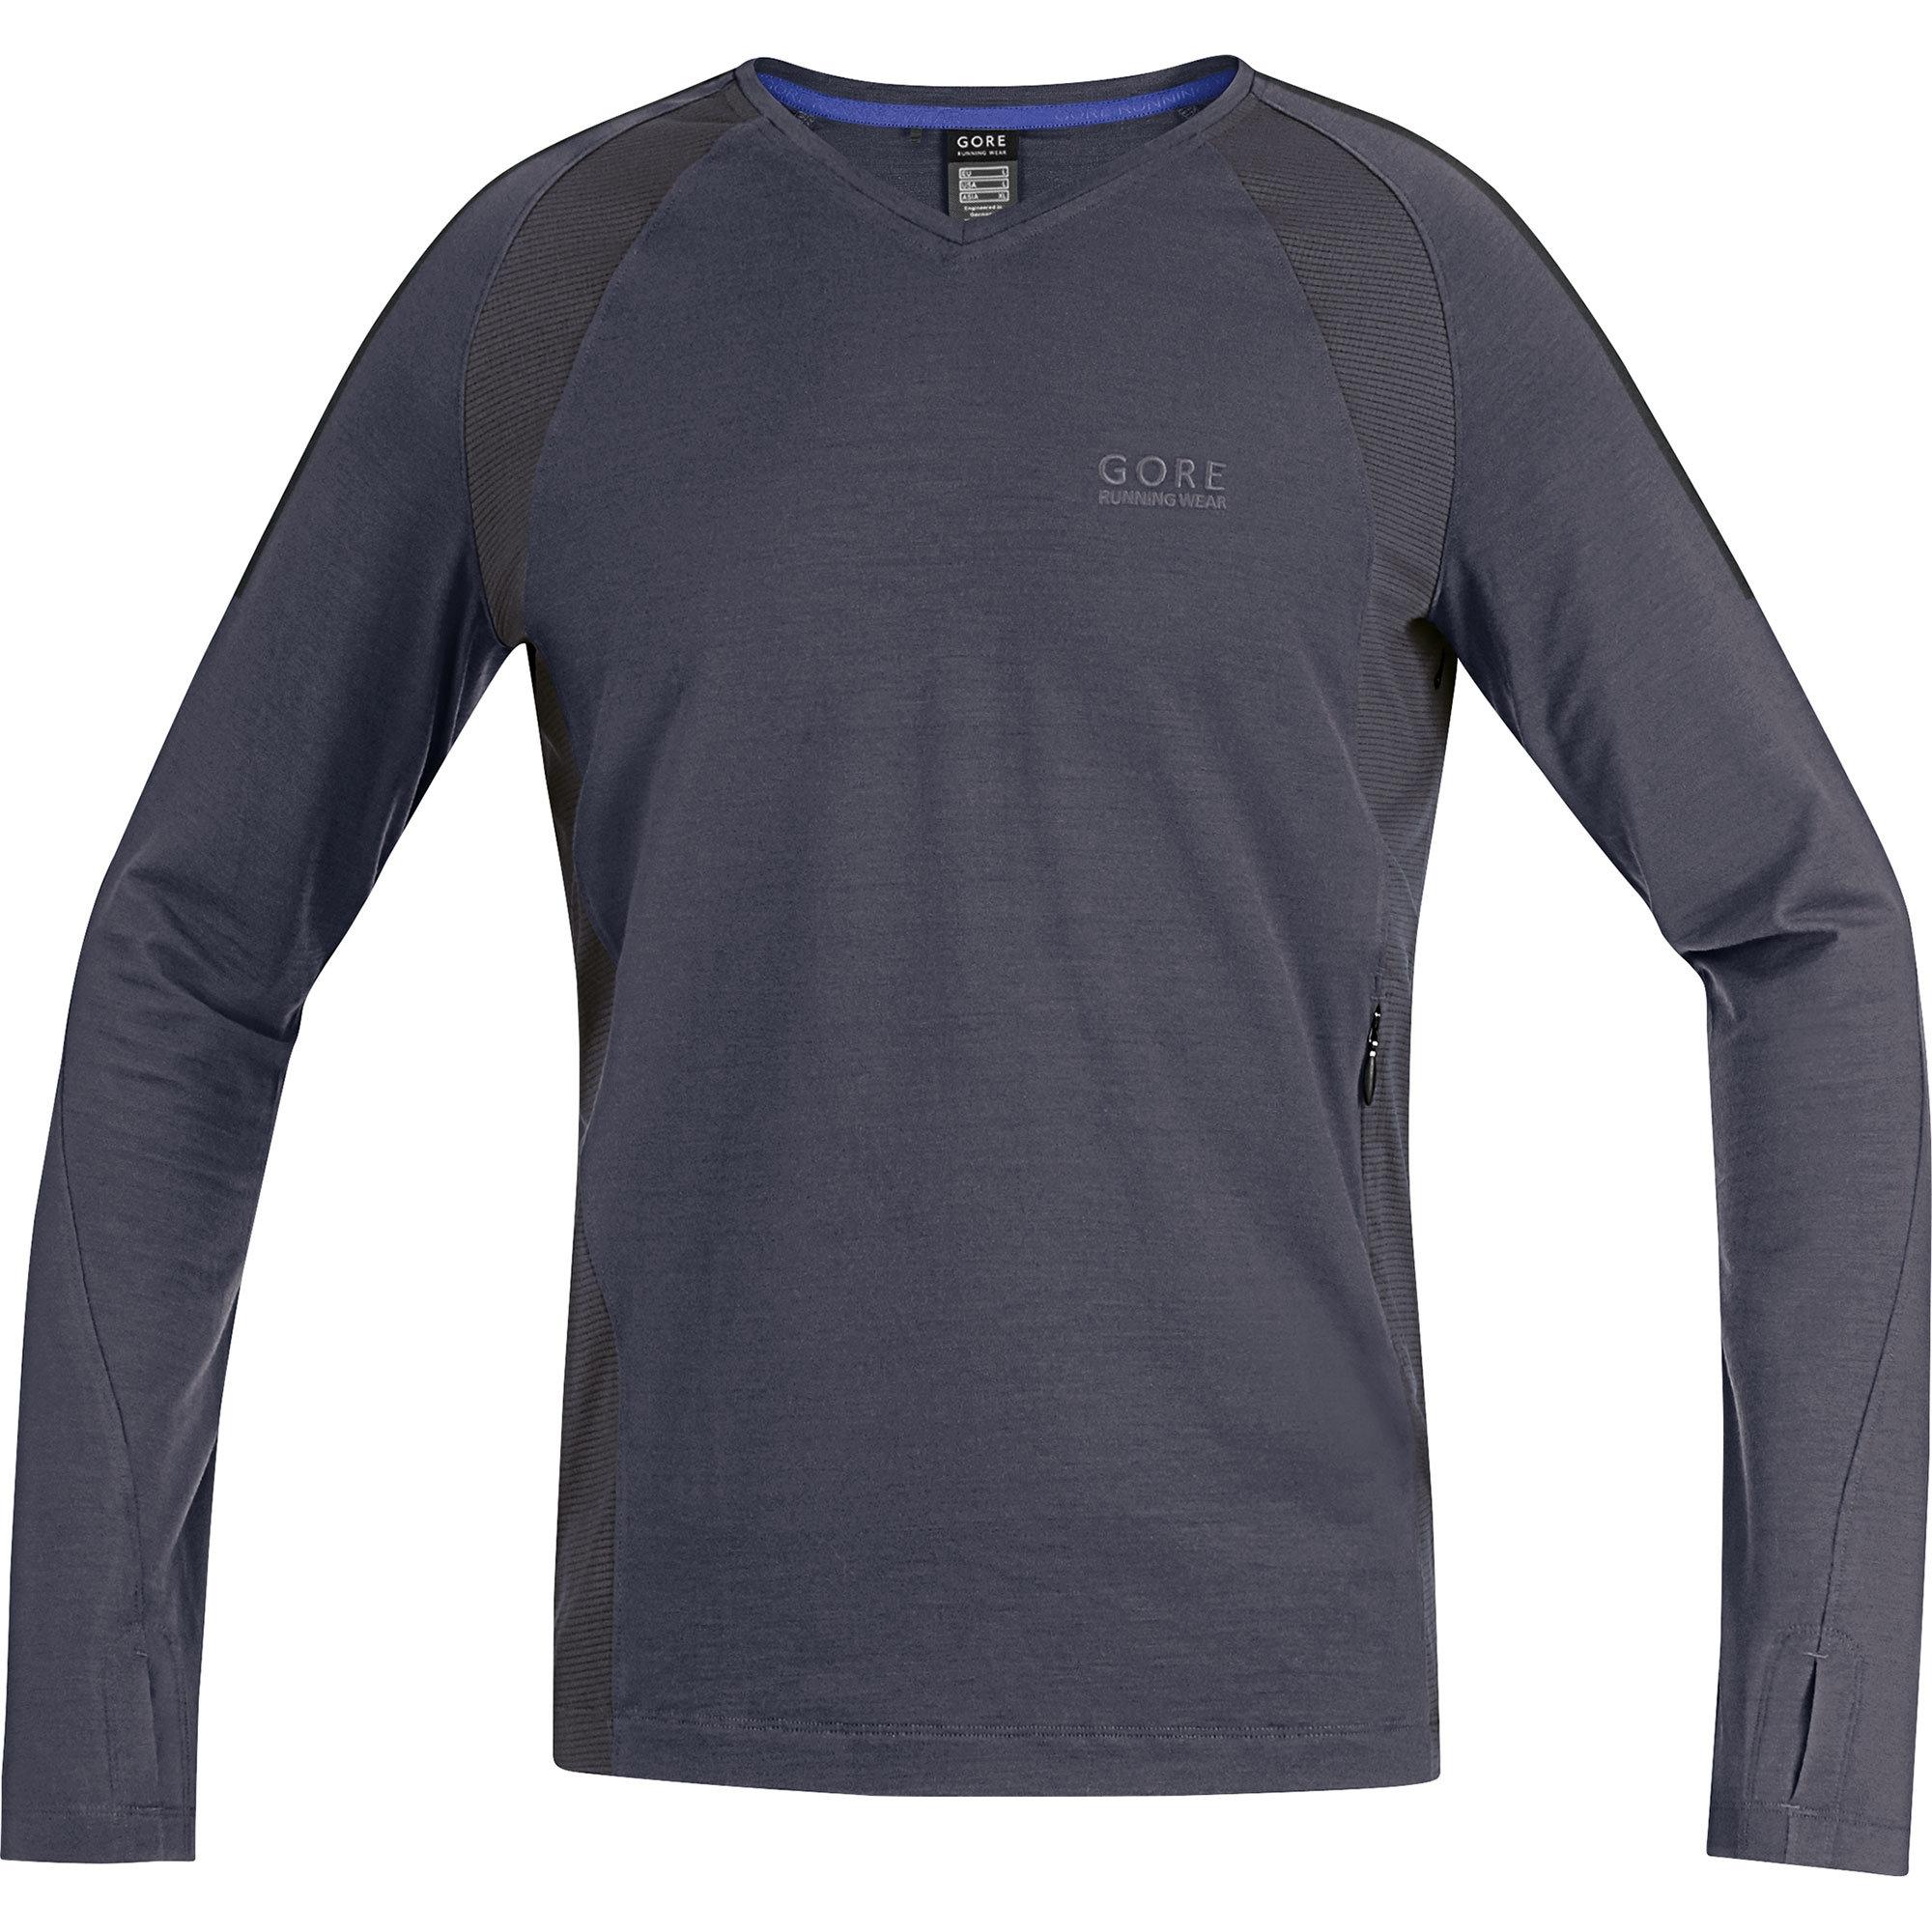 Gore Urban Run 2.0 Shirt long in Graphit Grey